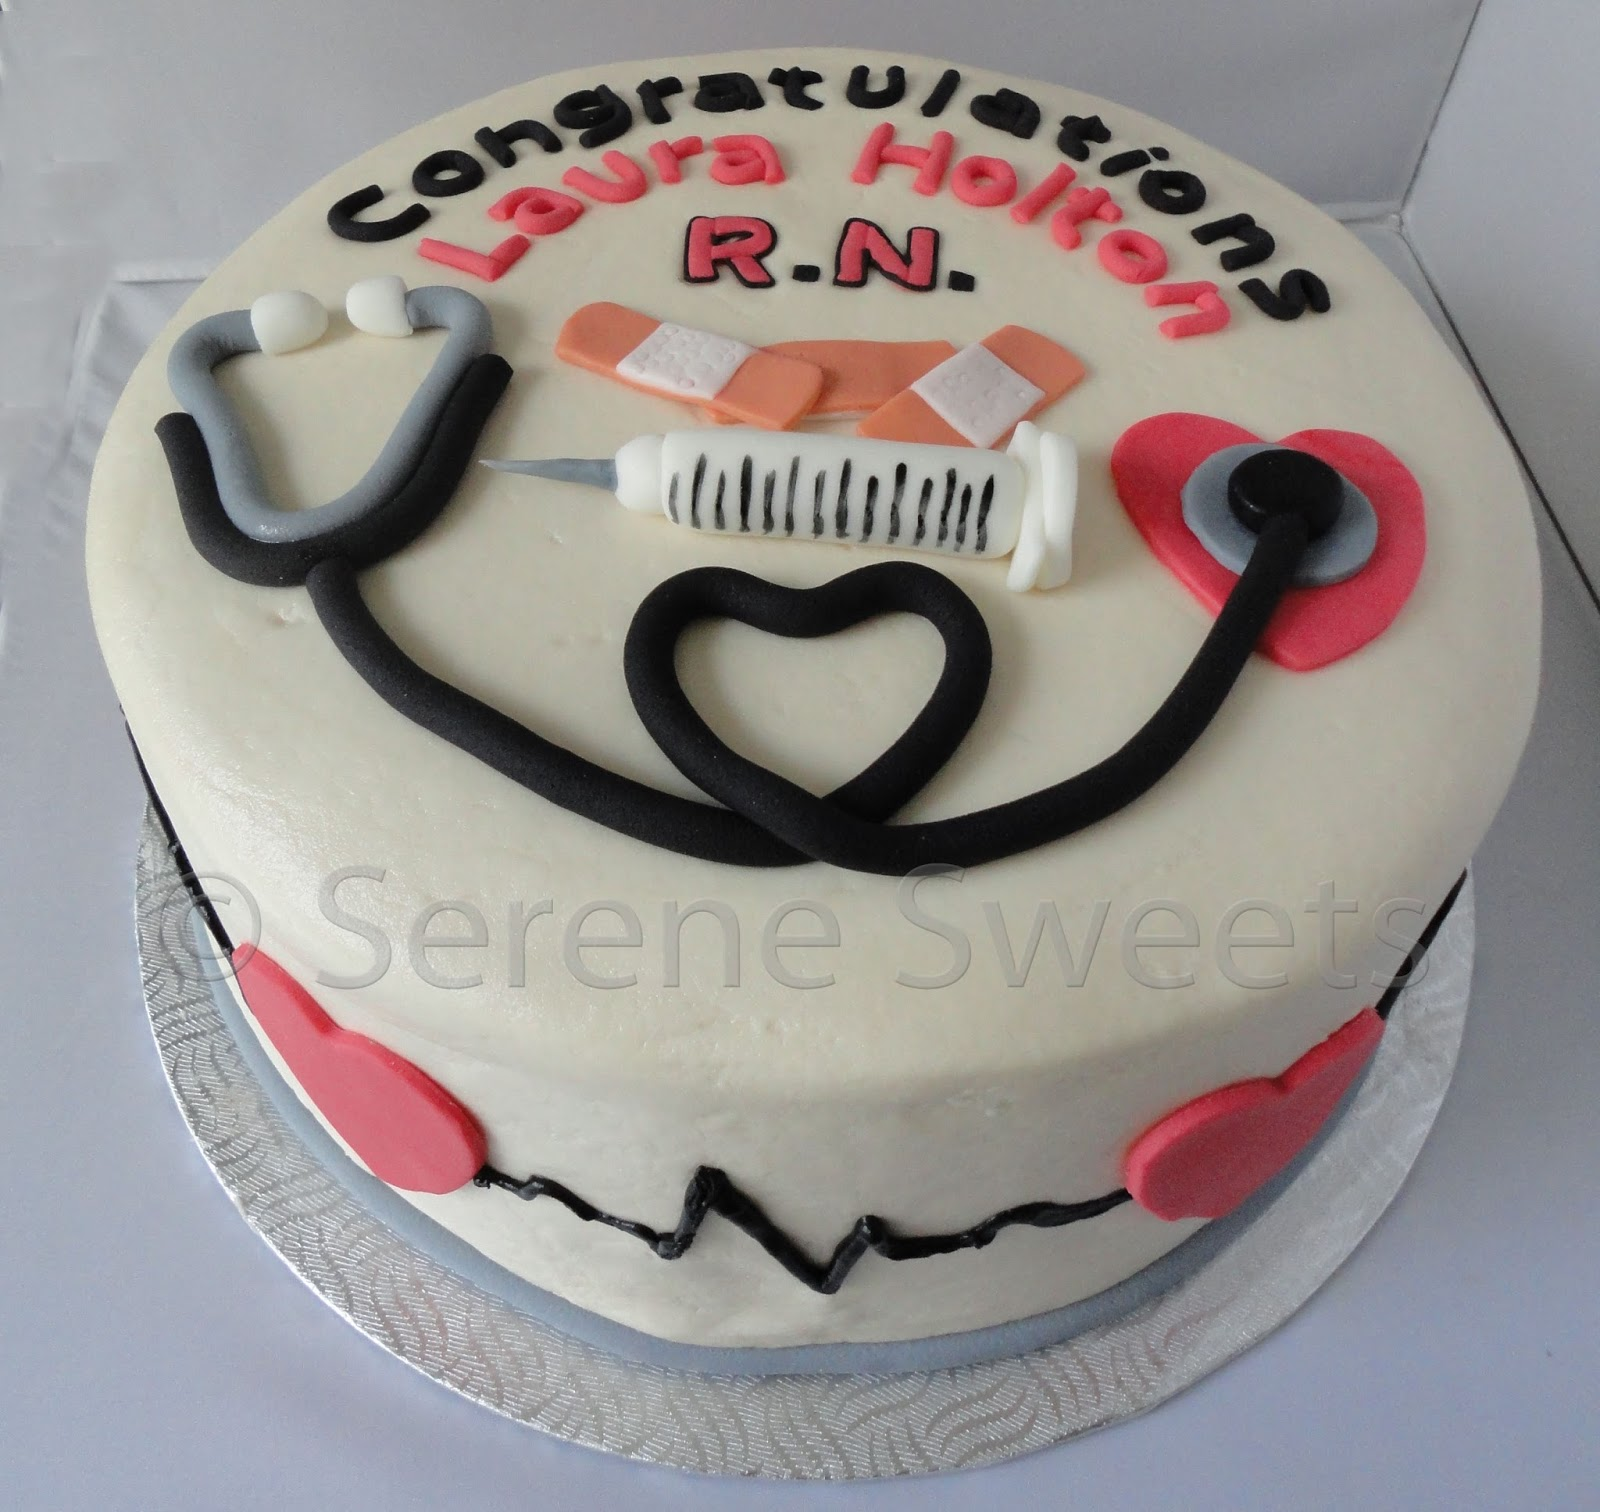 Serene Sweets Nurse Cake